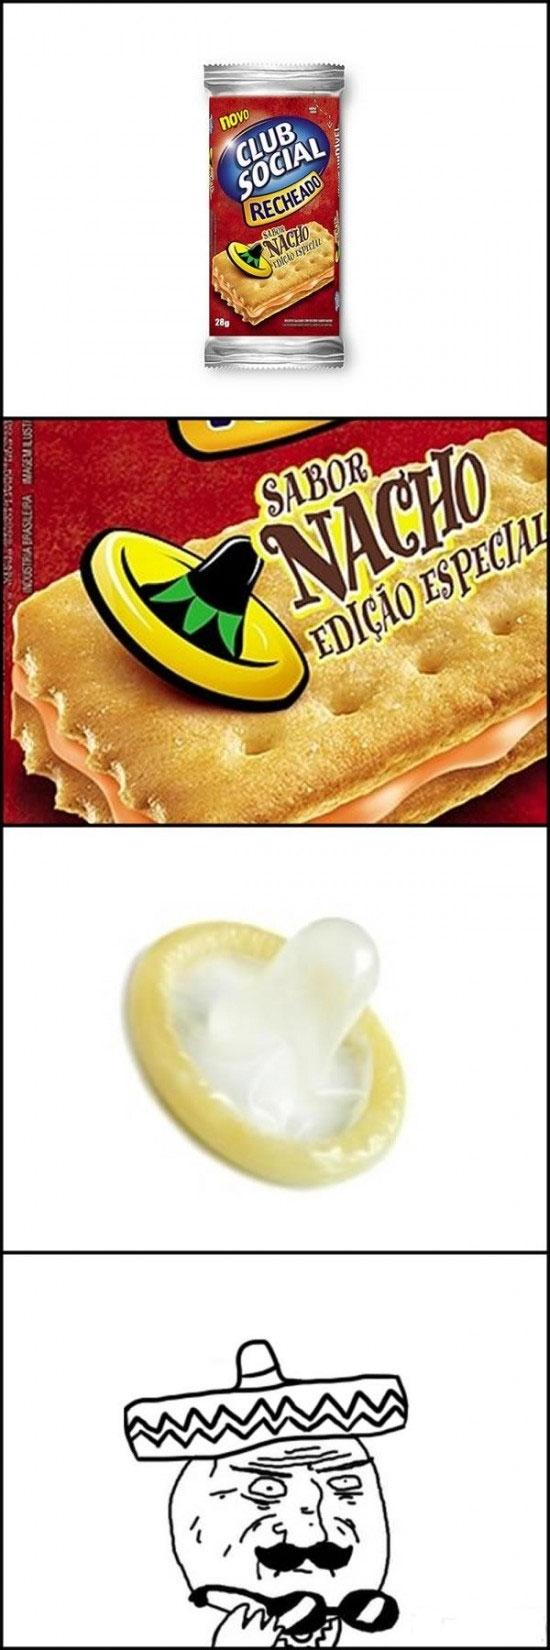 Mother_of_god - Preservativos con sabor a nachos